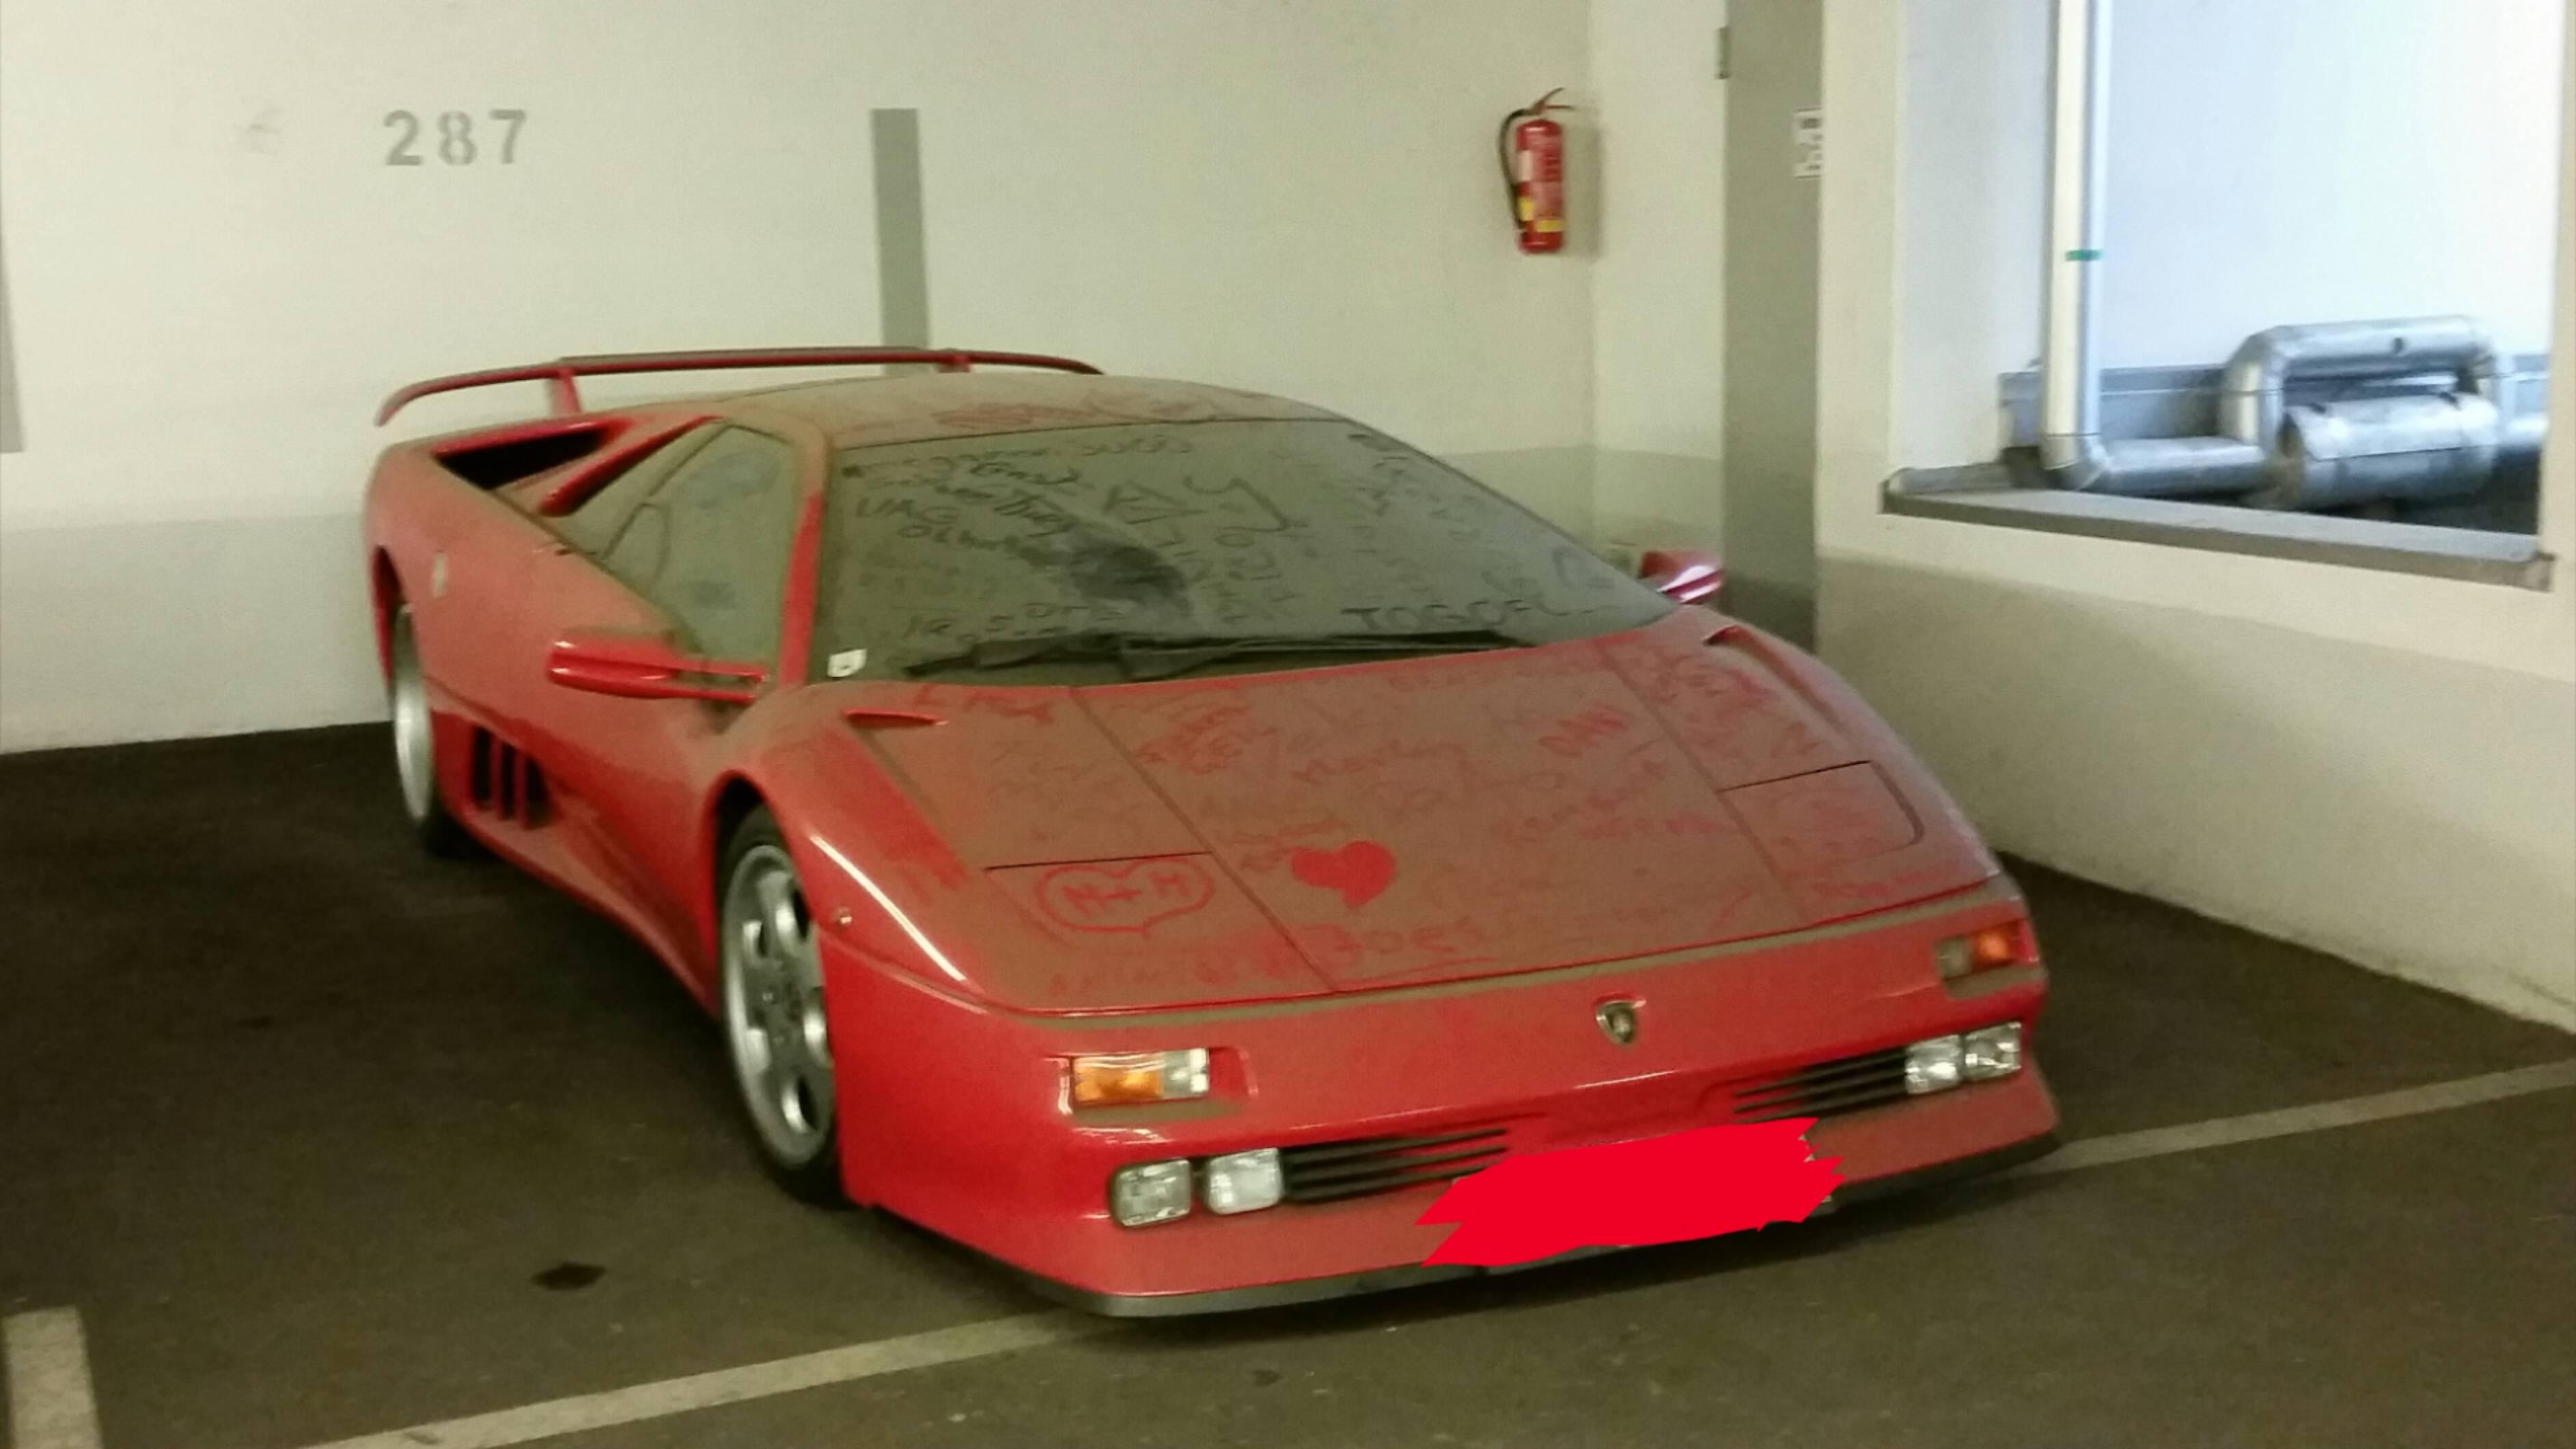 Rare Lamborghini Diablo SE30 Abandoned in Austria Has a Heart Drawn on Its Hood